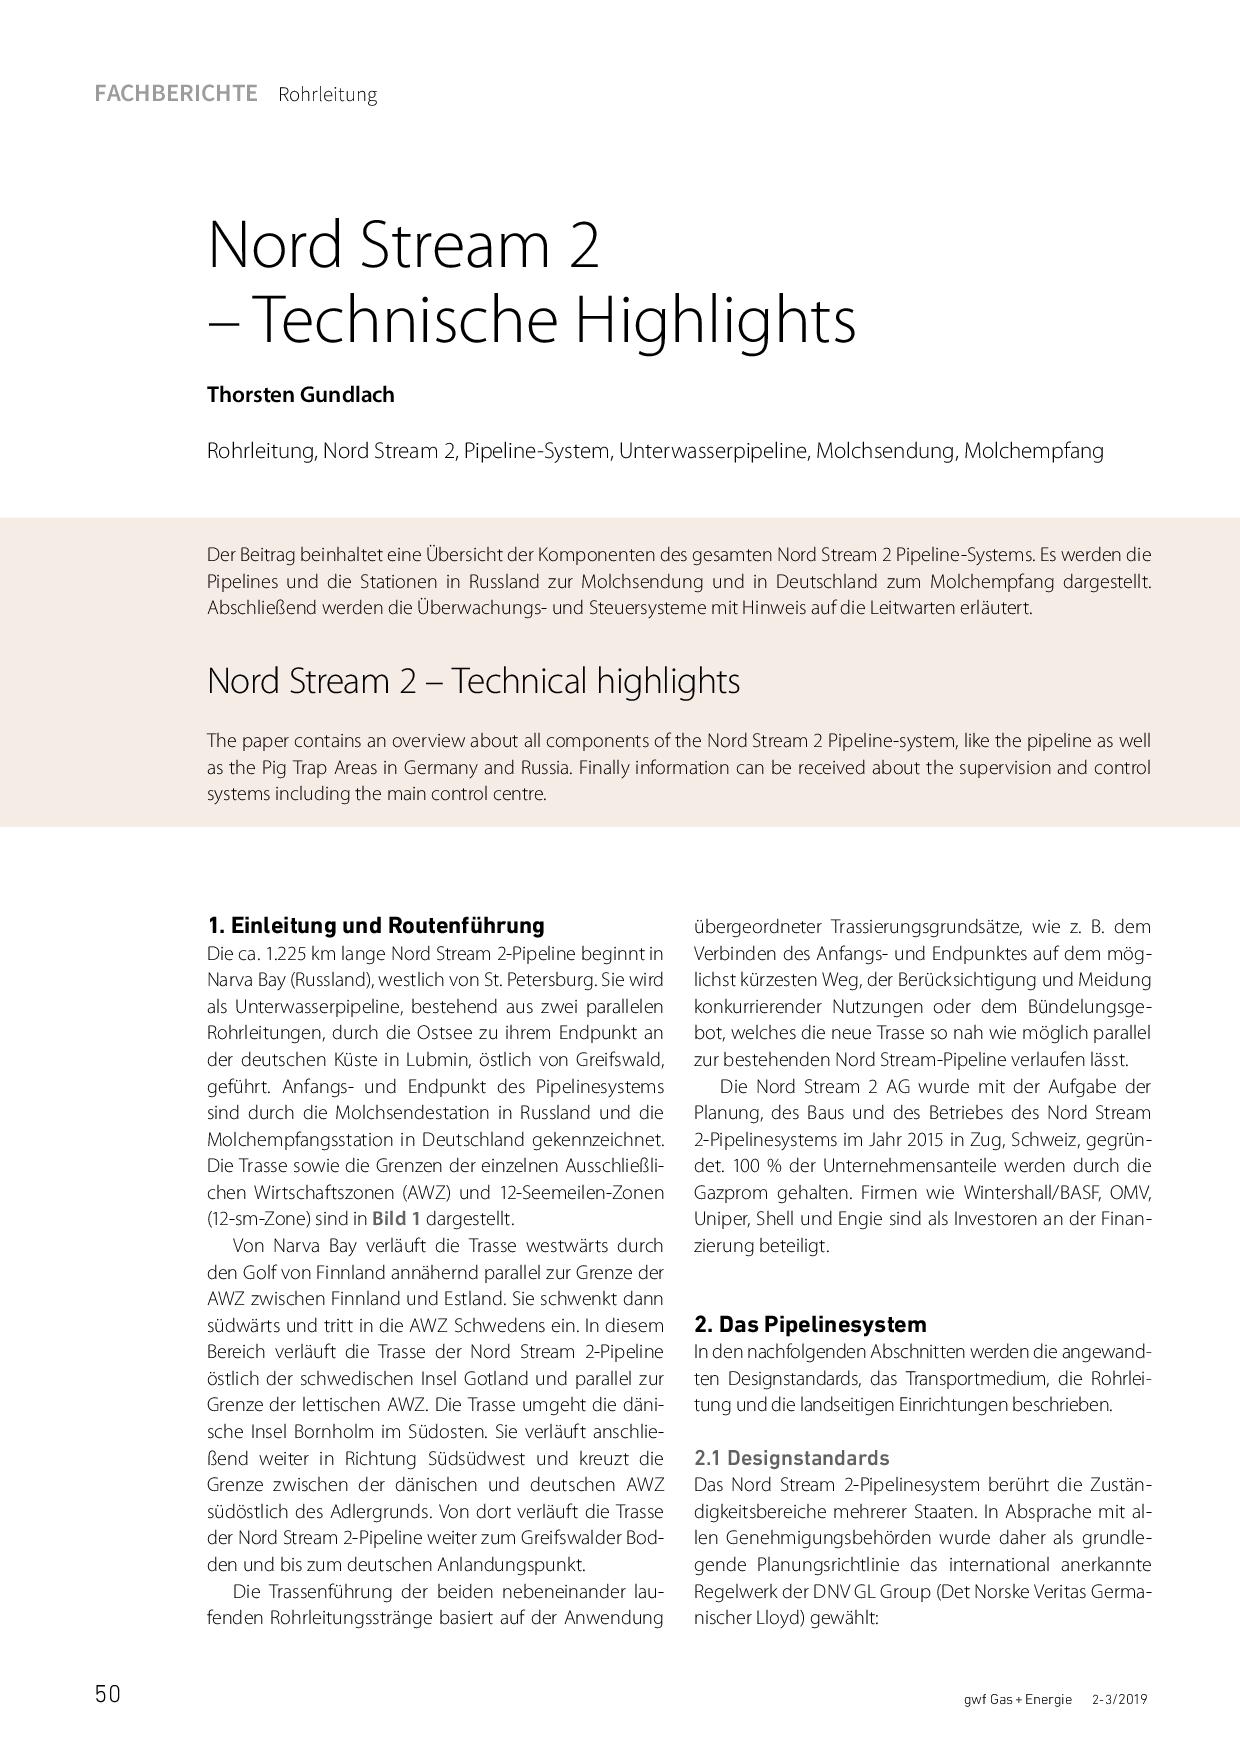 Nord Stream 2 – Technische Highlights